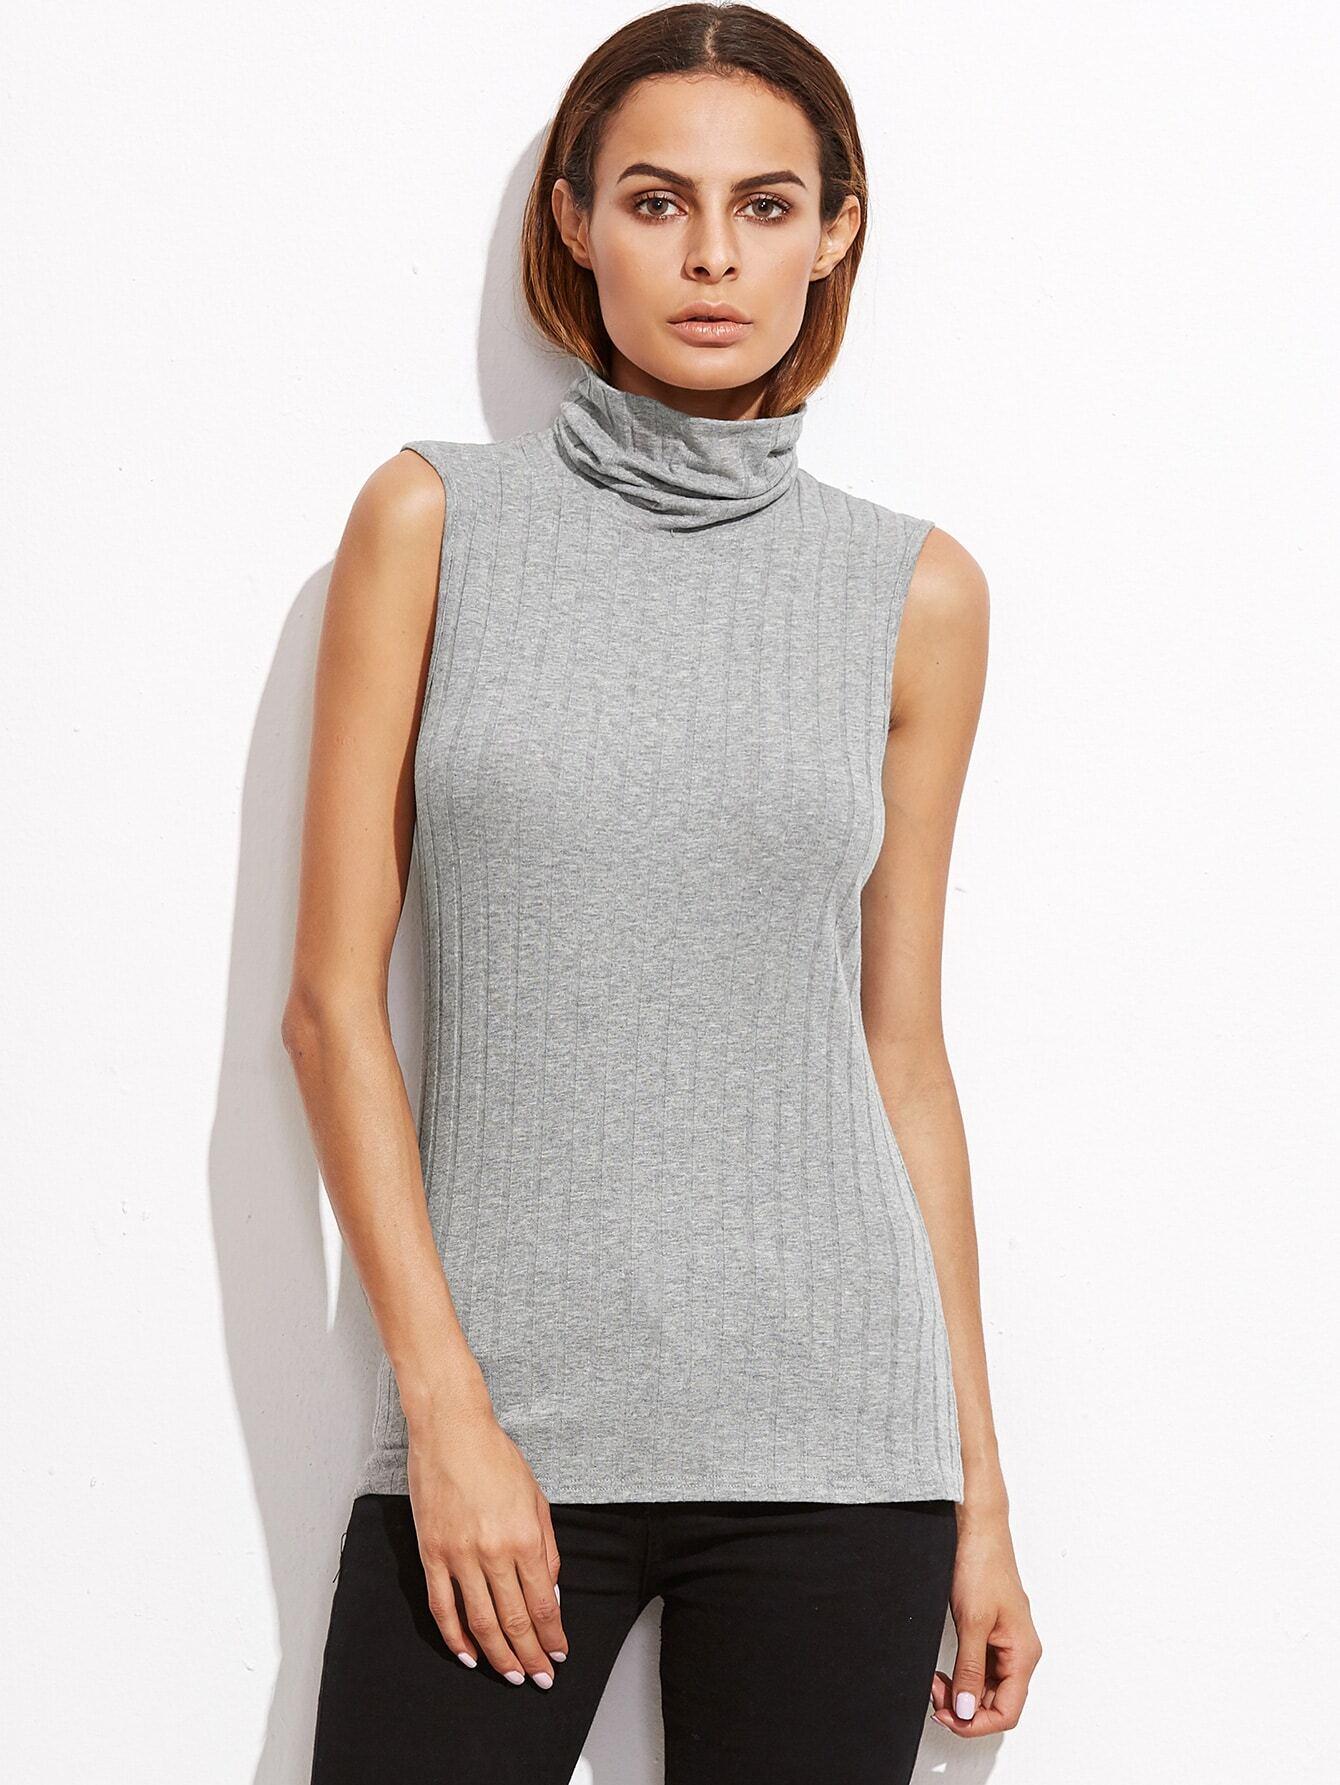 Heather Grey Cowl Neck Ribbed Sleeveless Top vest161018701